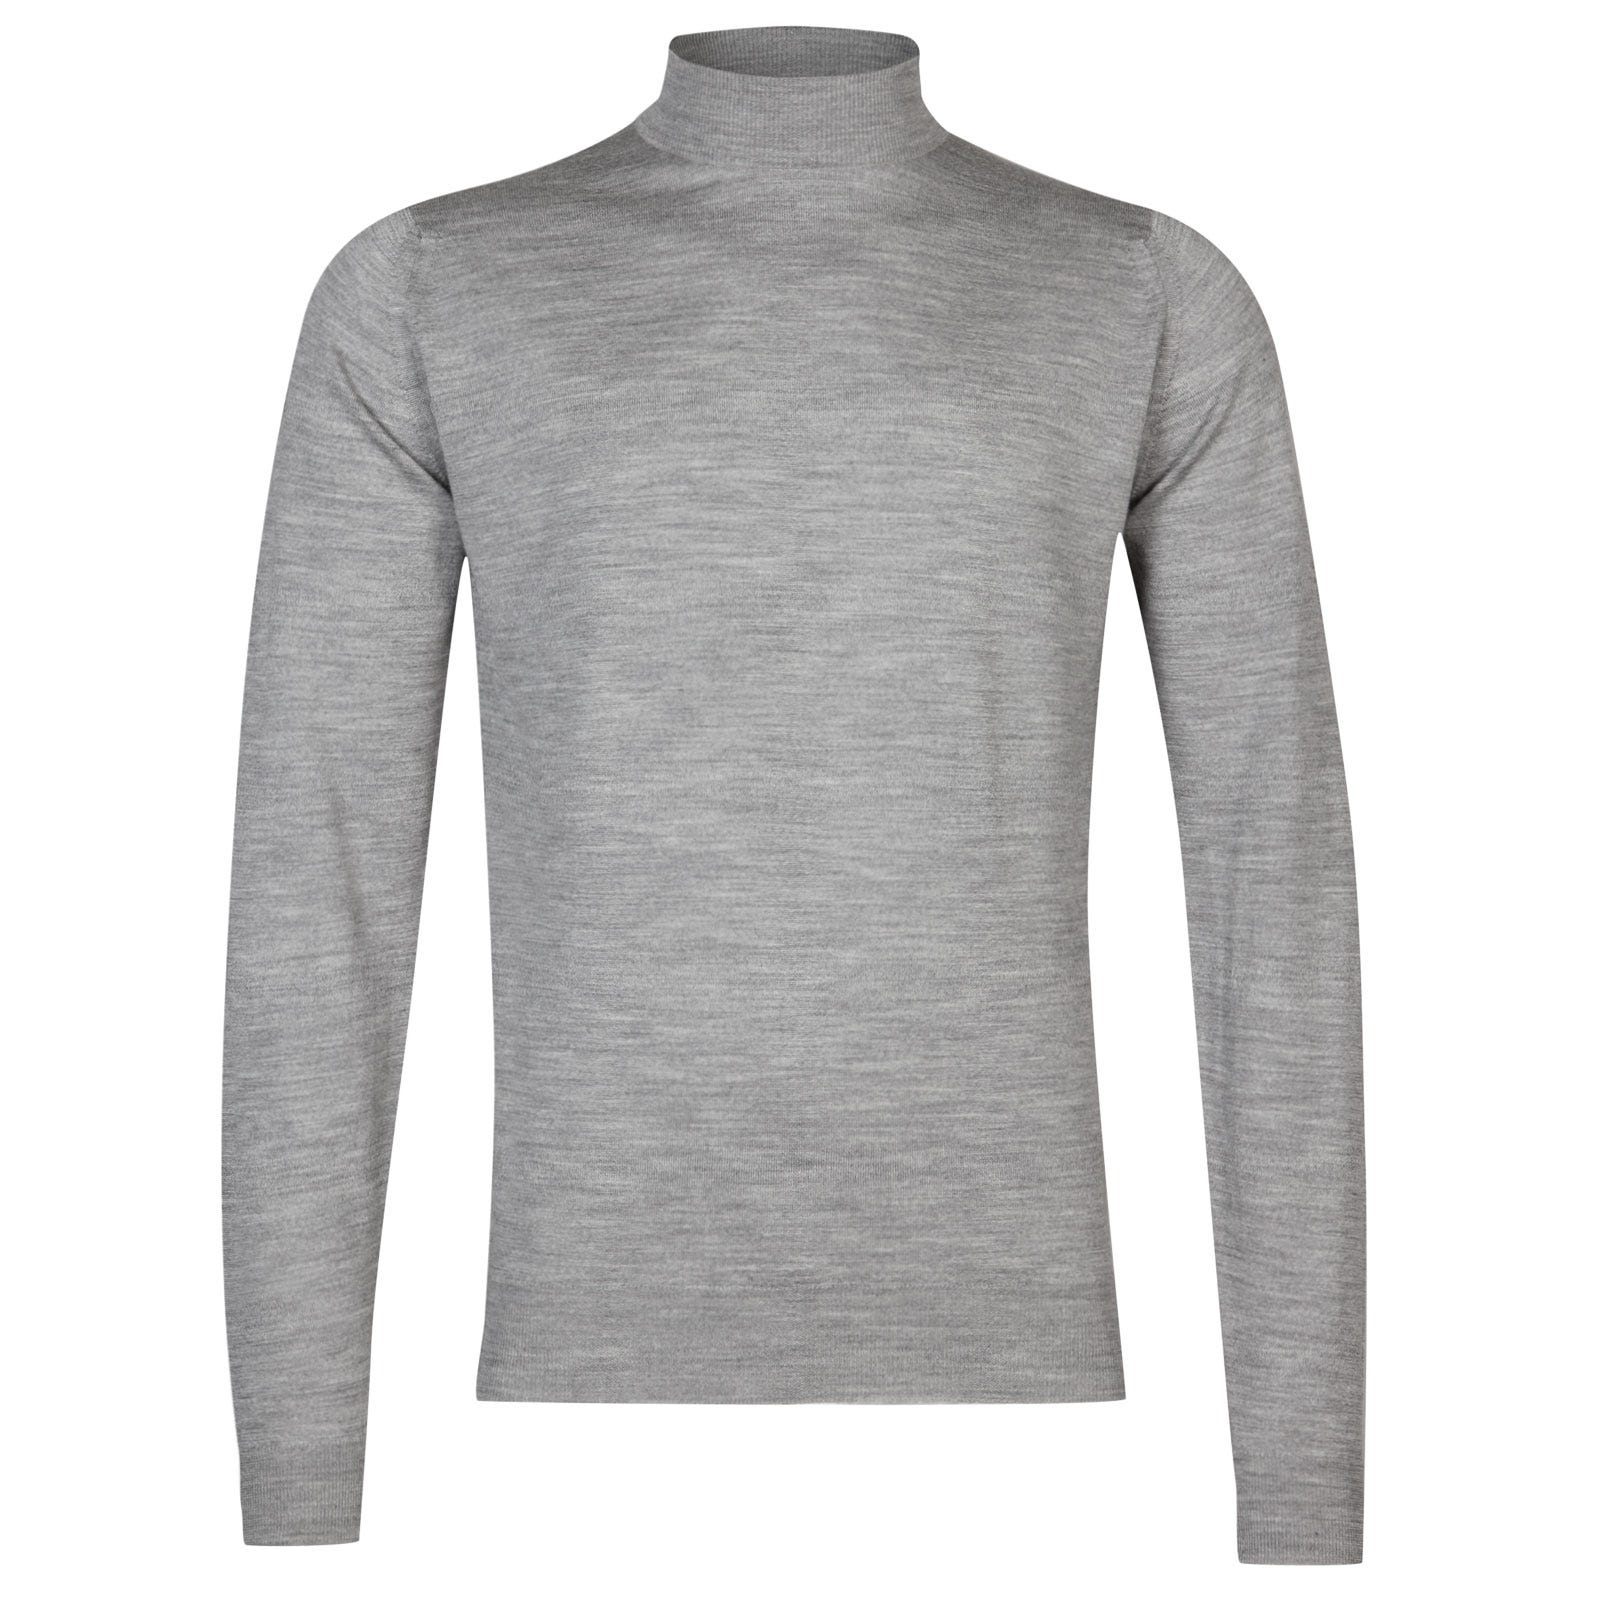 John Smedley harcourt Merino Wool Pullover in Silver-L